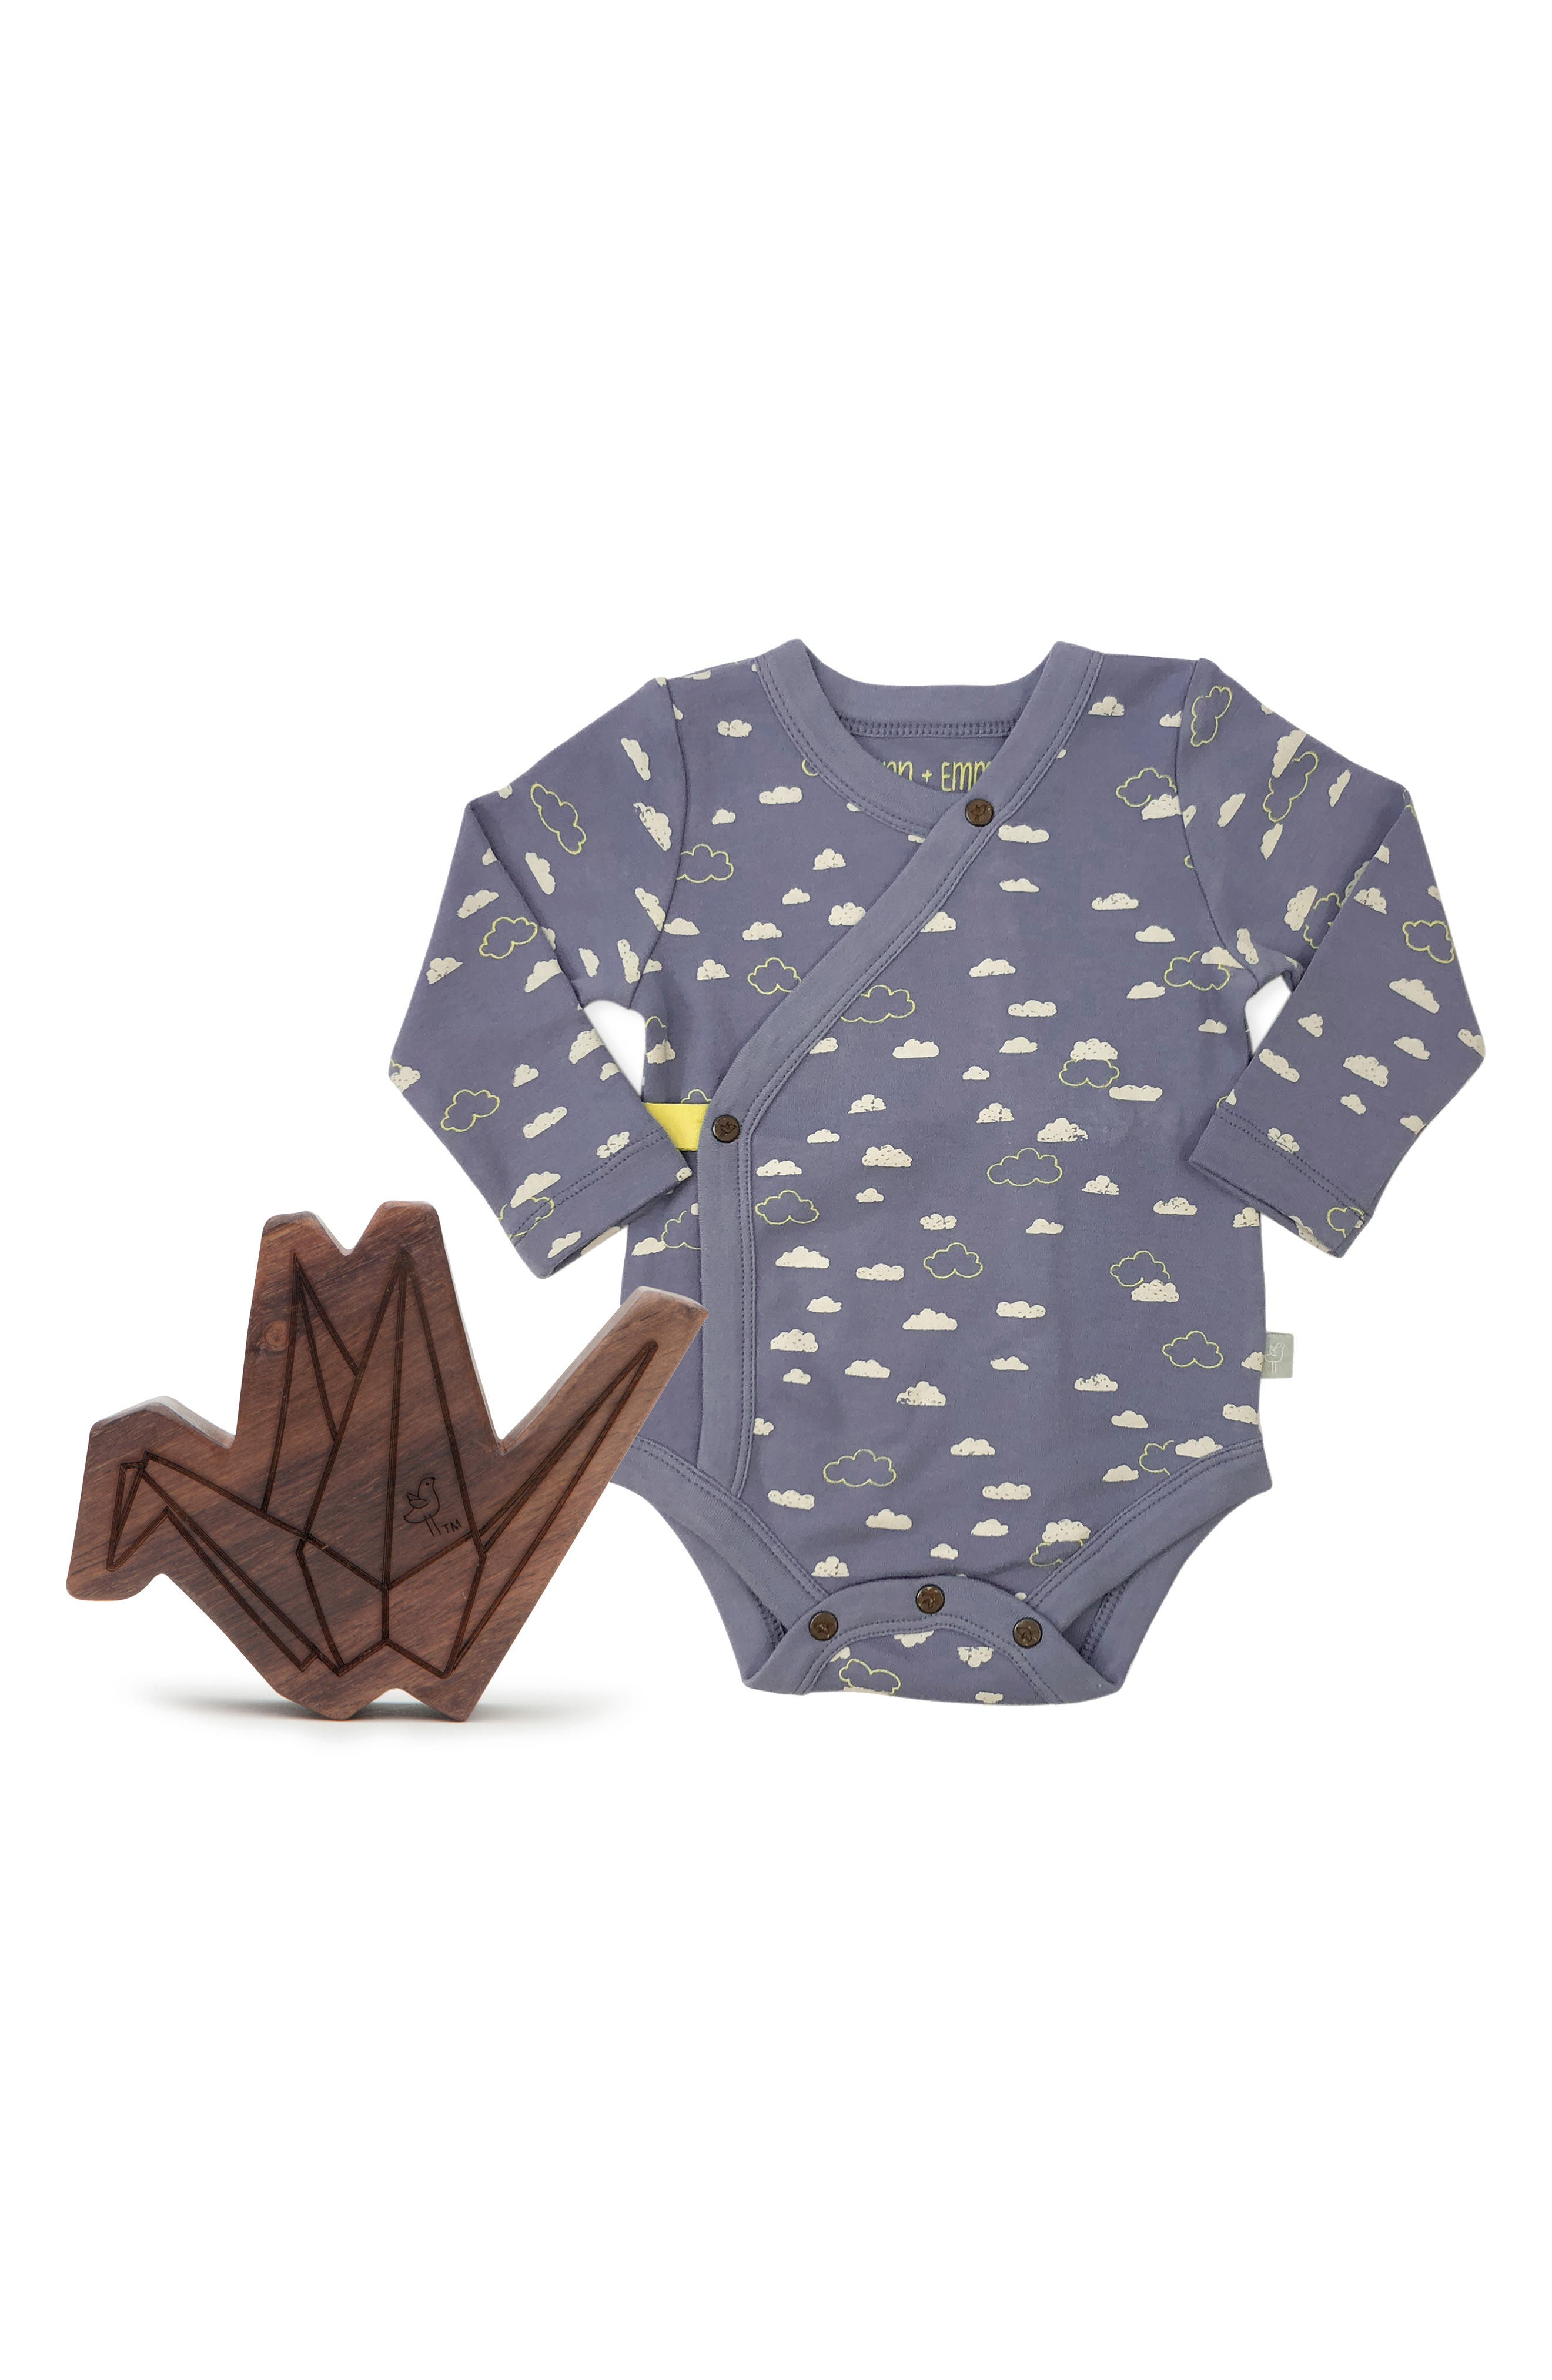 Clouds Organic Cotton Wrap Bodysuit & Origami Wood Teether Rattle Set,                             Main thumbnail 1, color,                             BLUE